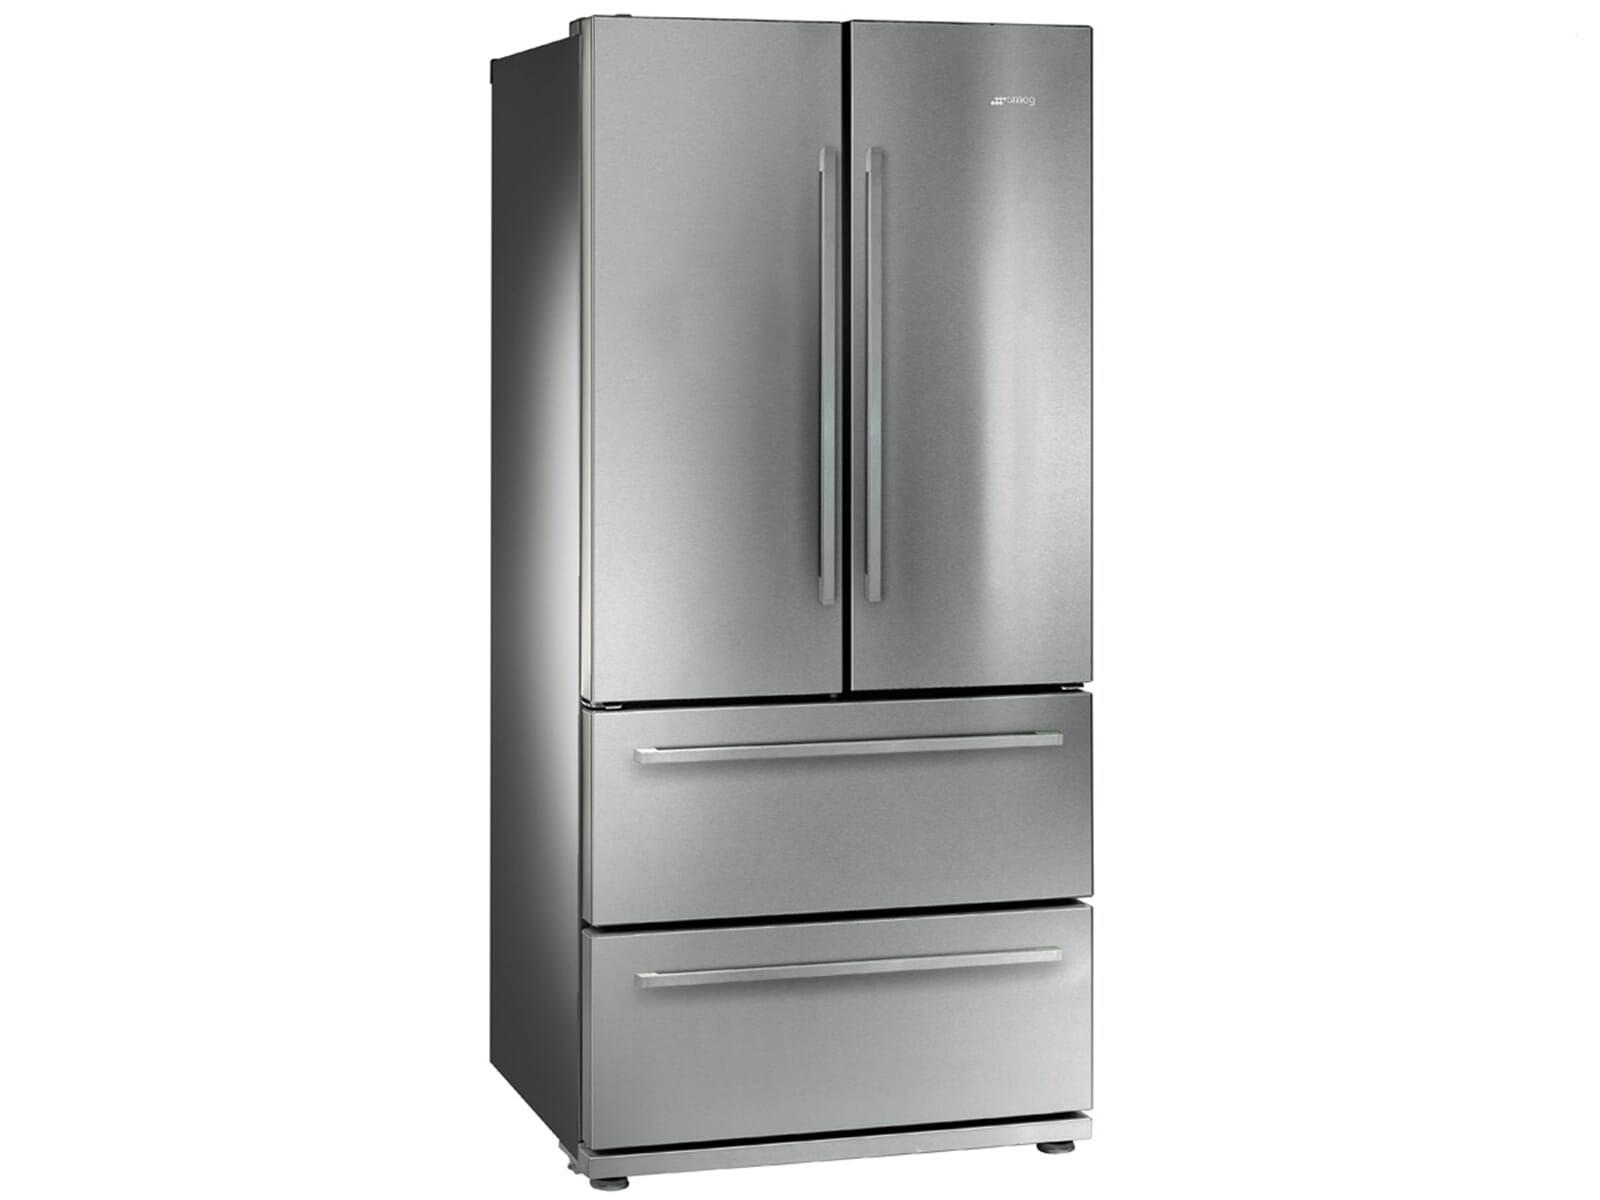 Side By Side Kühlschrank Elektra Bregenz : Daewoo kühlschrank ohne festwasseranschluss hickman beverly